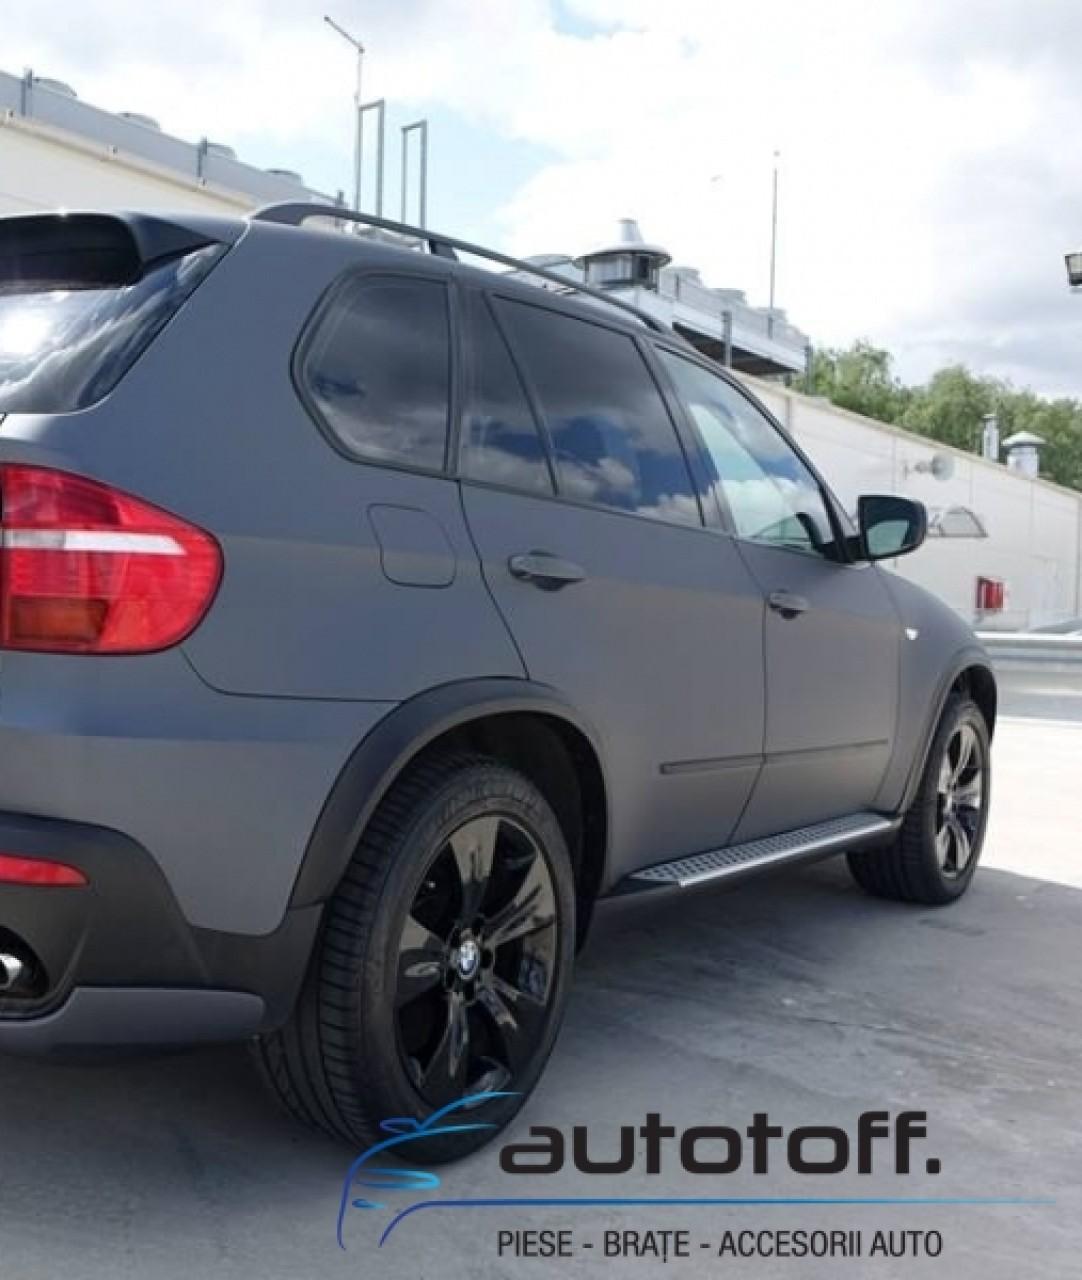 SET PRELUNGIRI ARIP BMW X5 E70 (07-13)